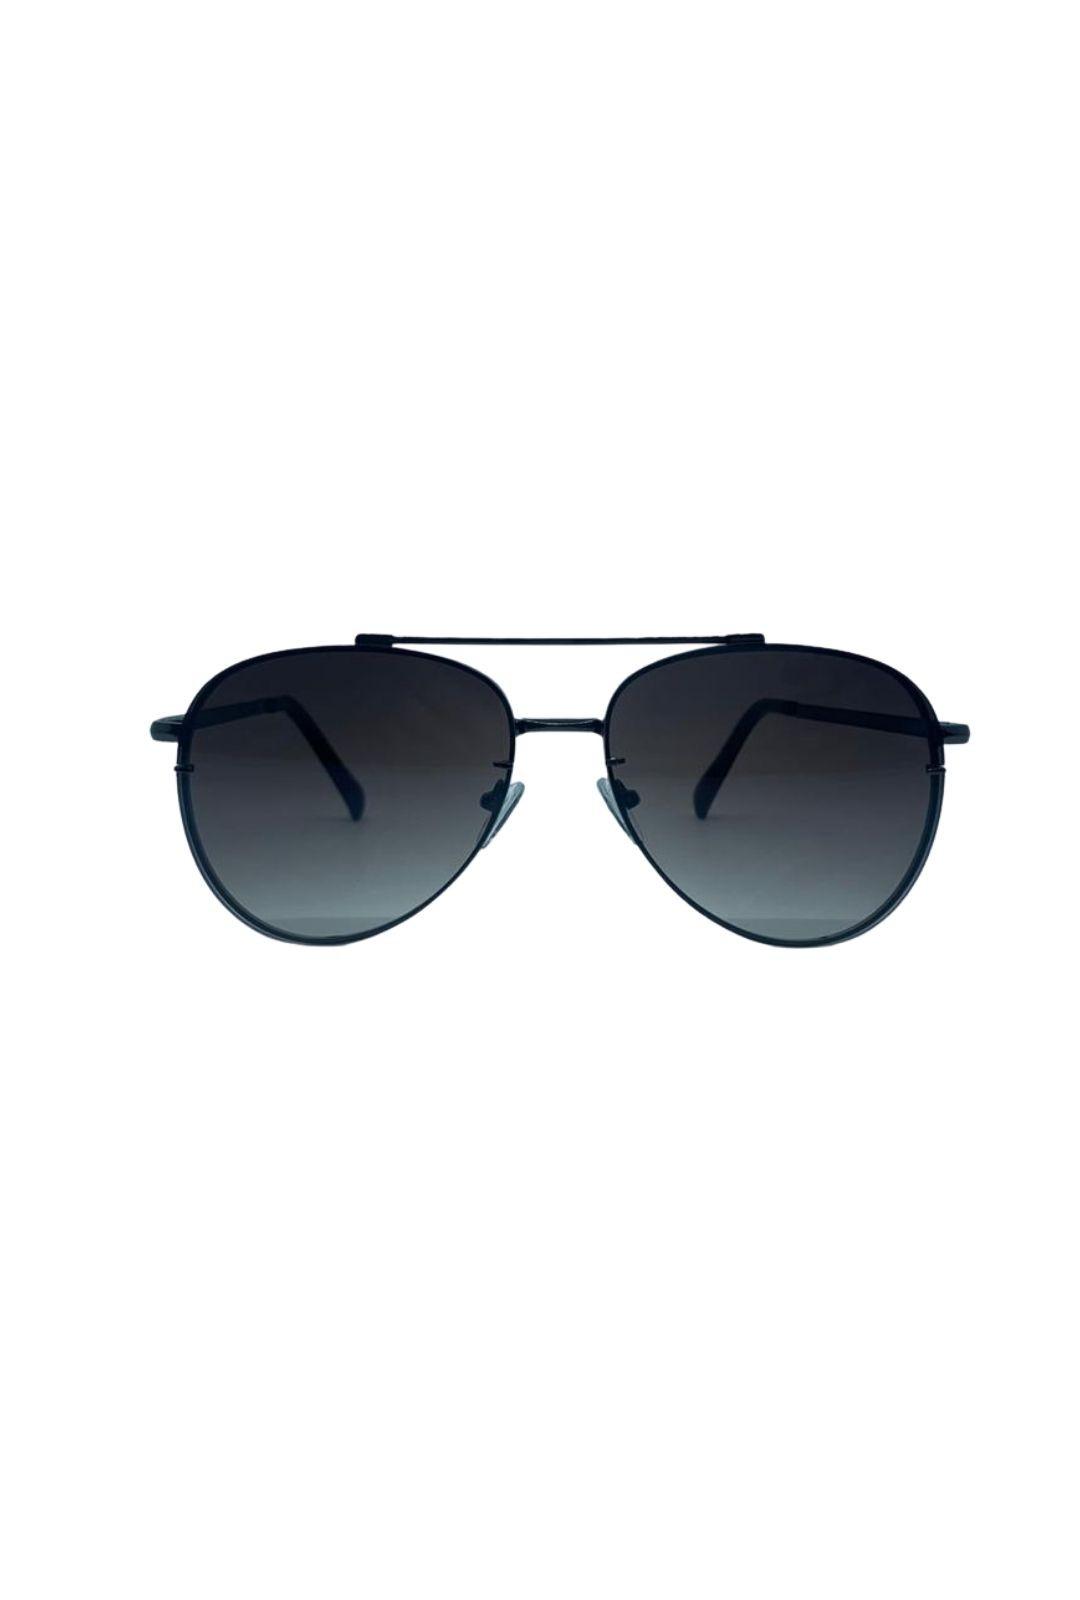 Óculos Iguatemi Preto